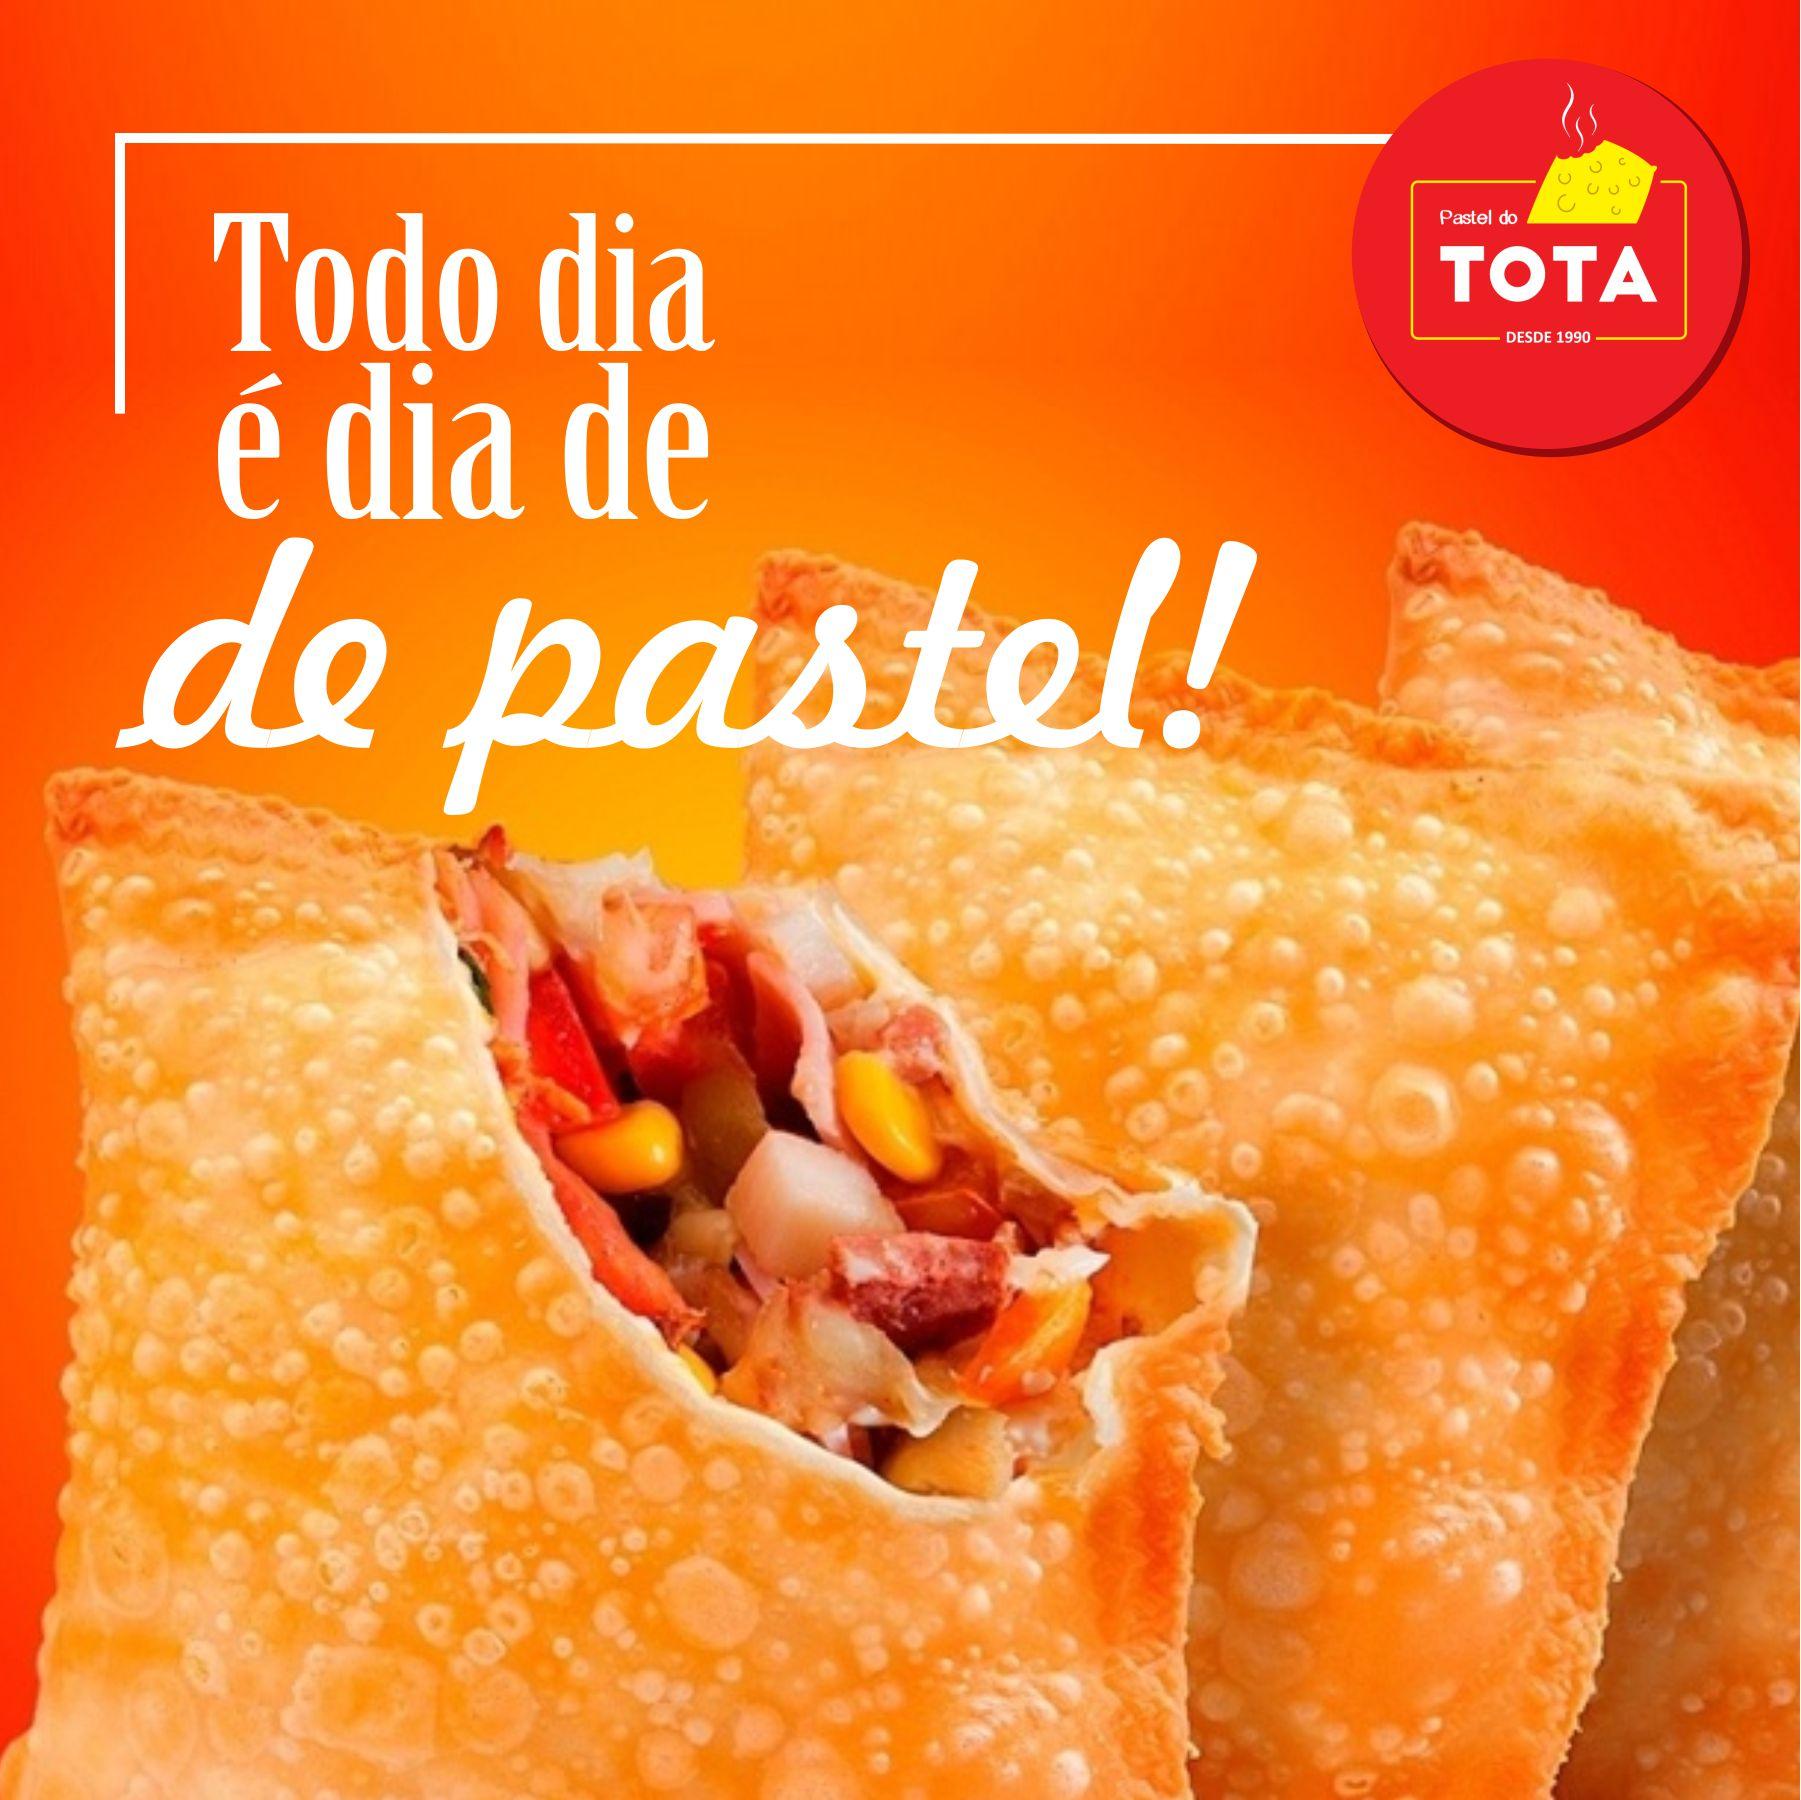 Pastel do Tota